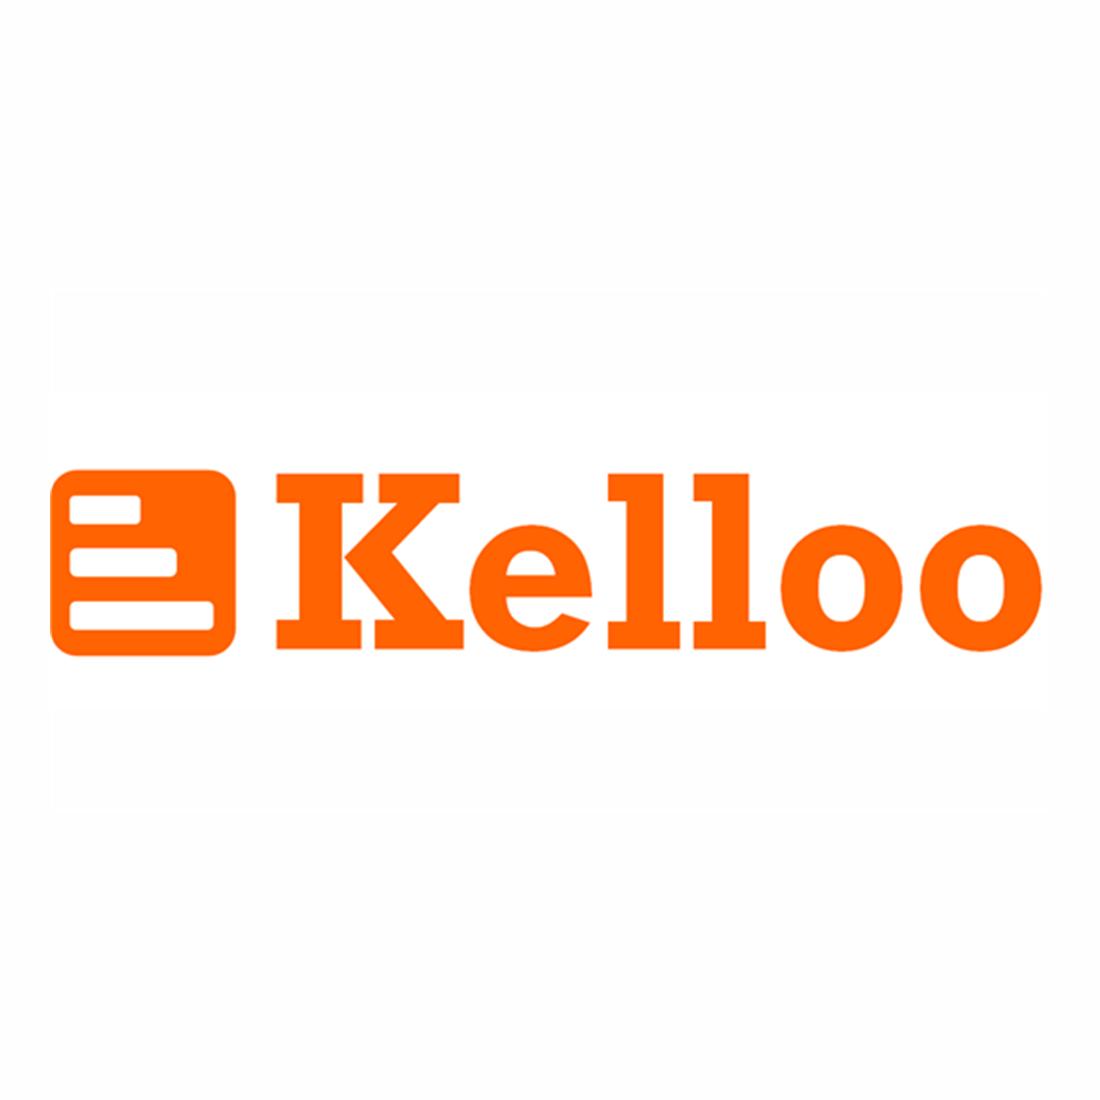 kelloo Logo